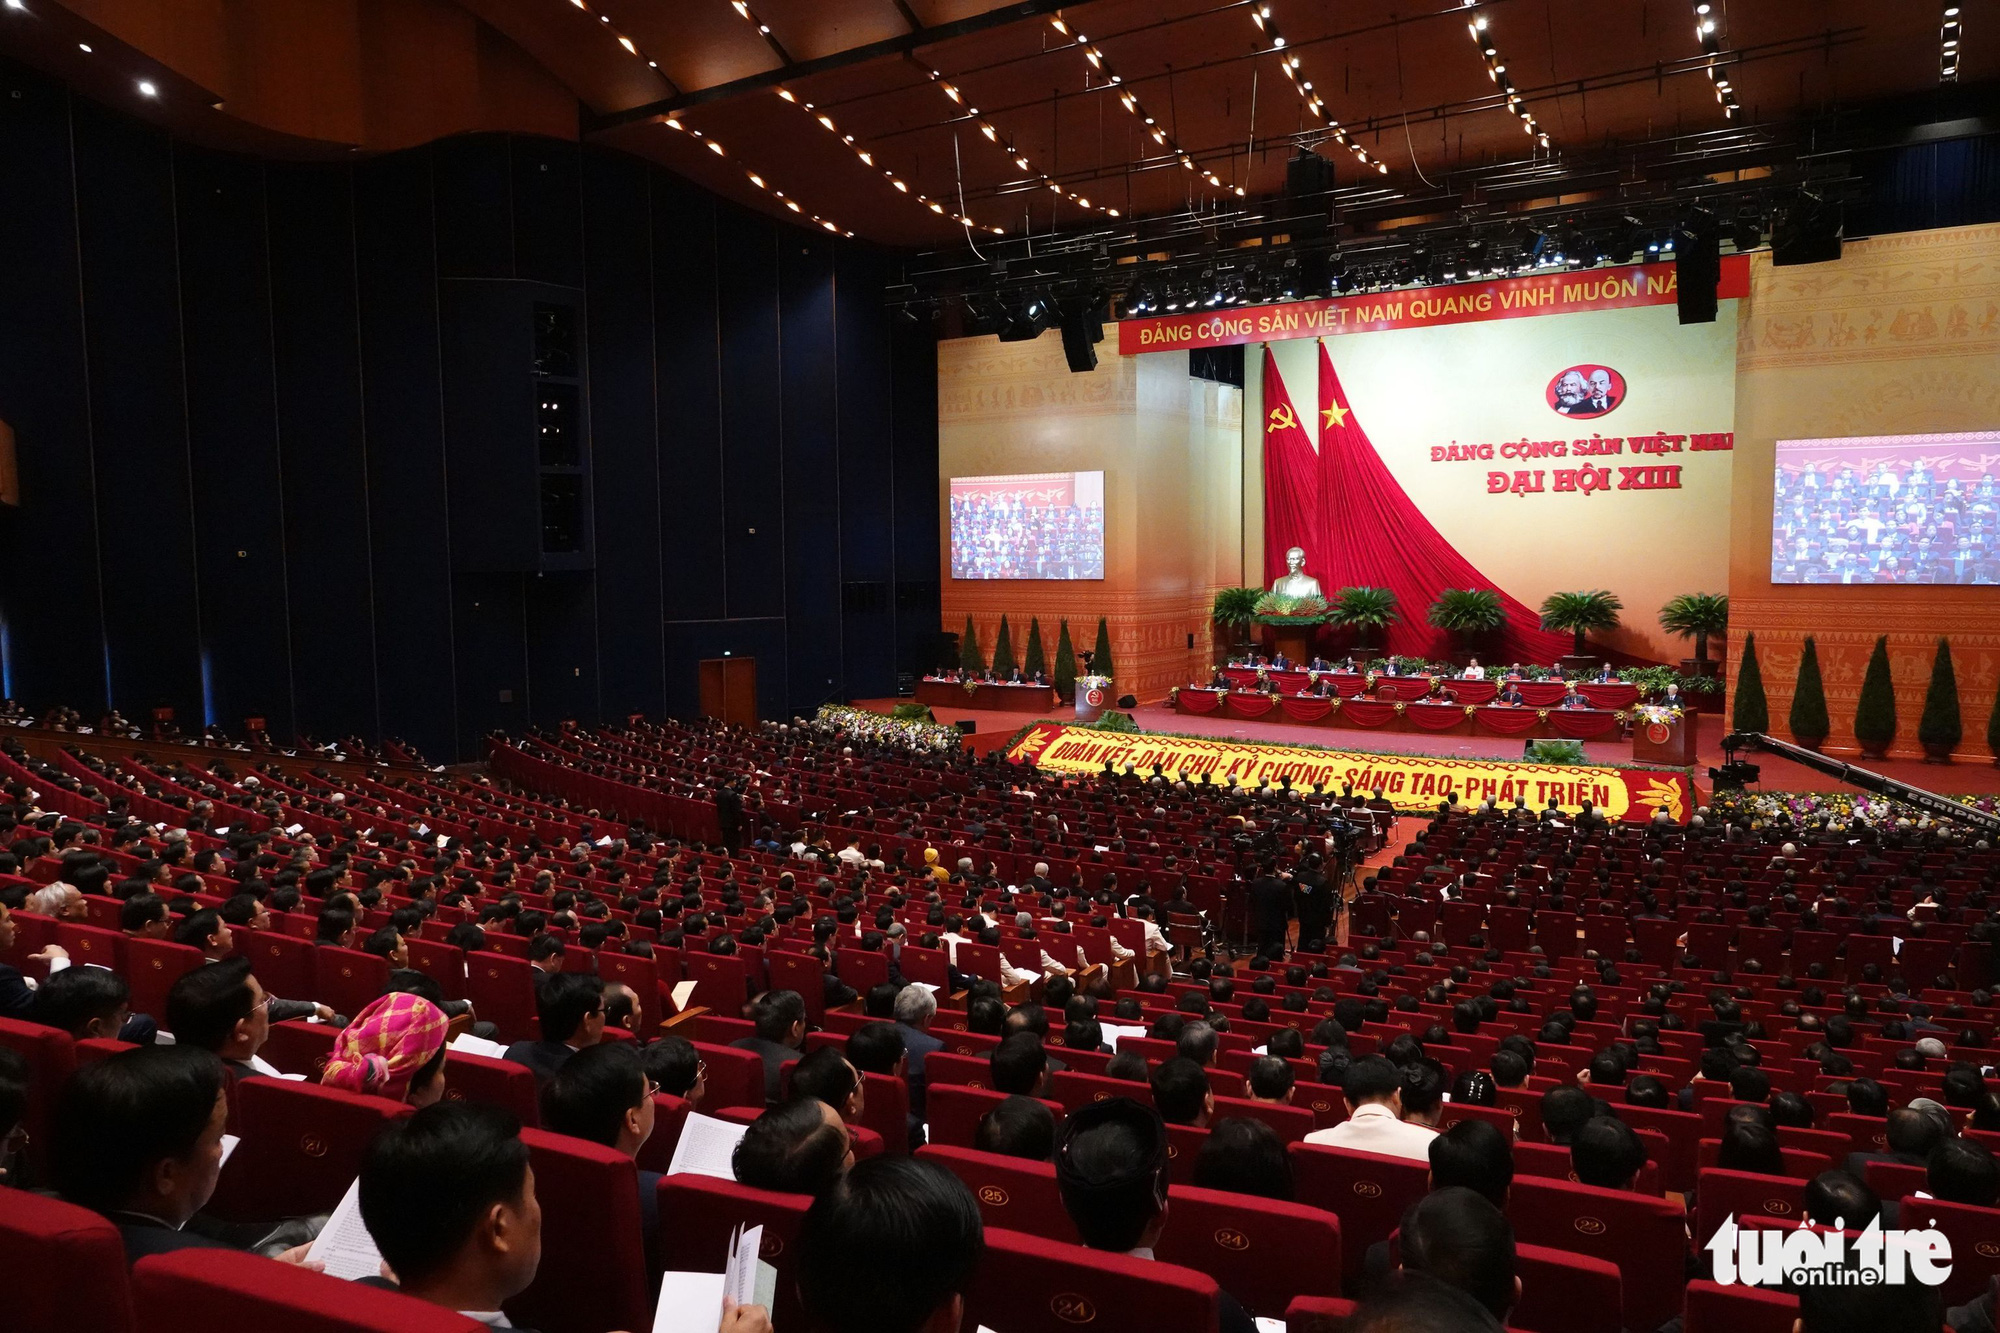 Vietnam's 13th National Party Congress opens in Hanoi, January 26, 2021. Photo: Vien Su / Tuoi Tre